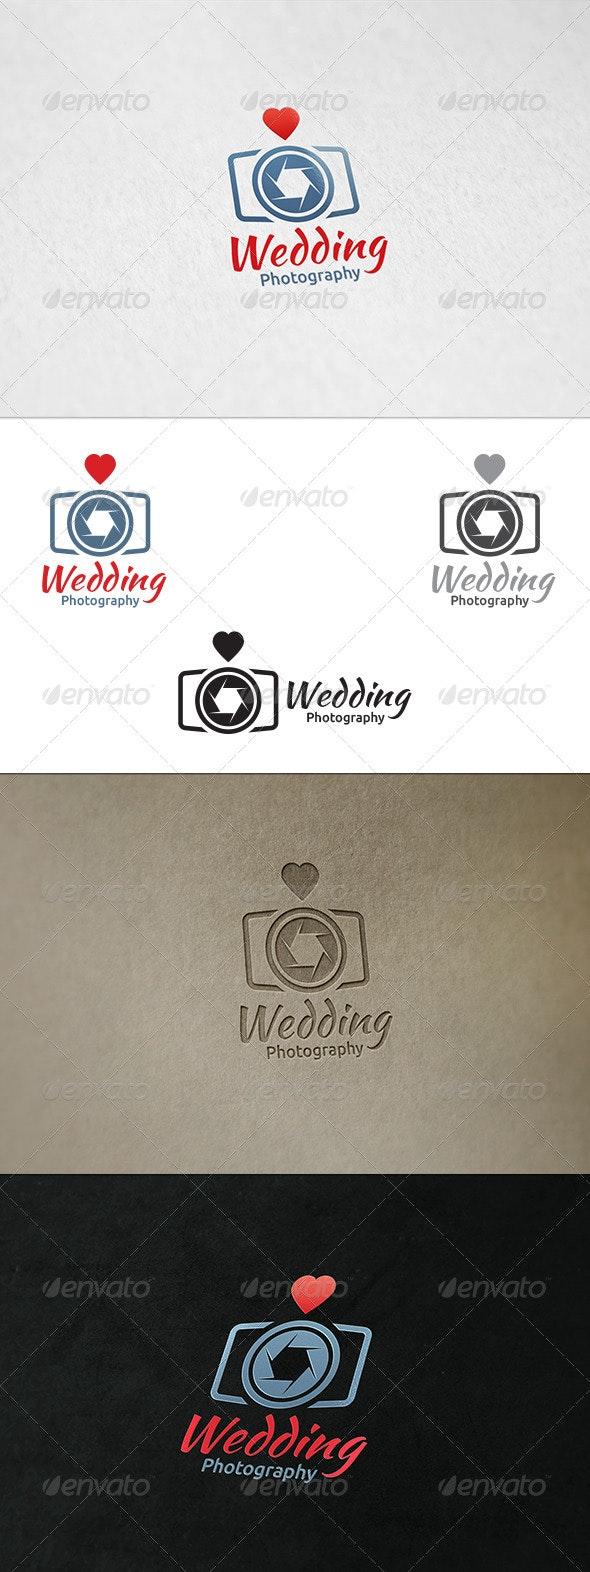 Wedding Photography - Logo Templates - Objects Logo Templates